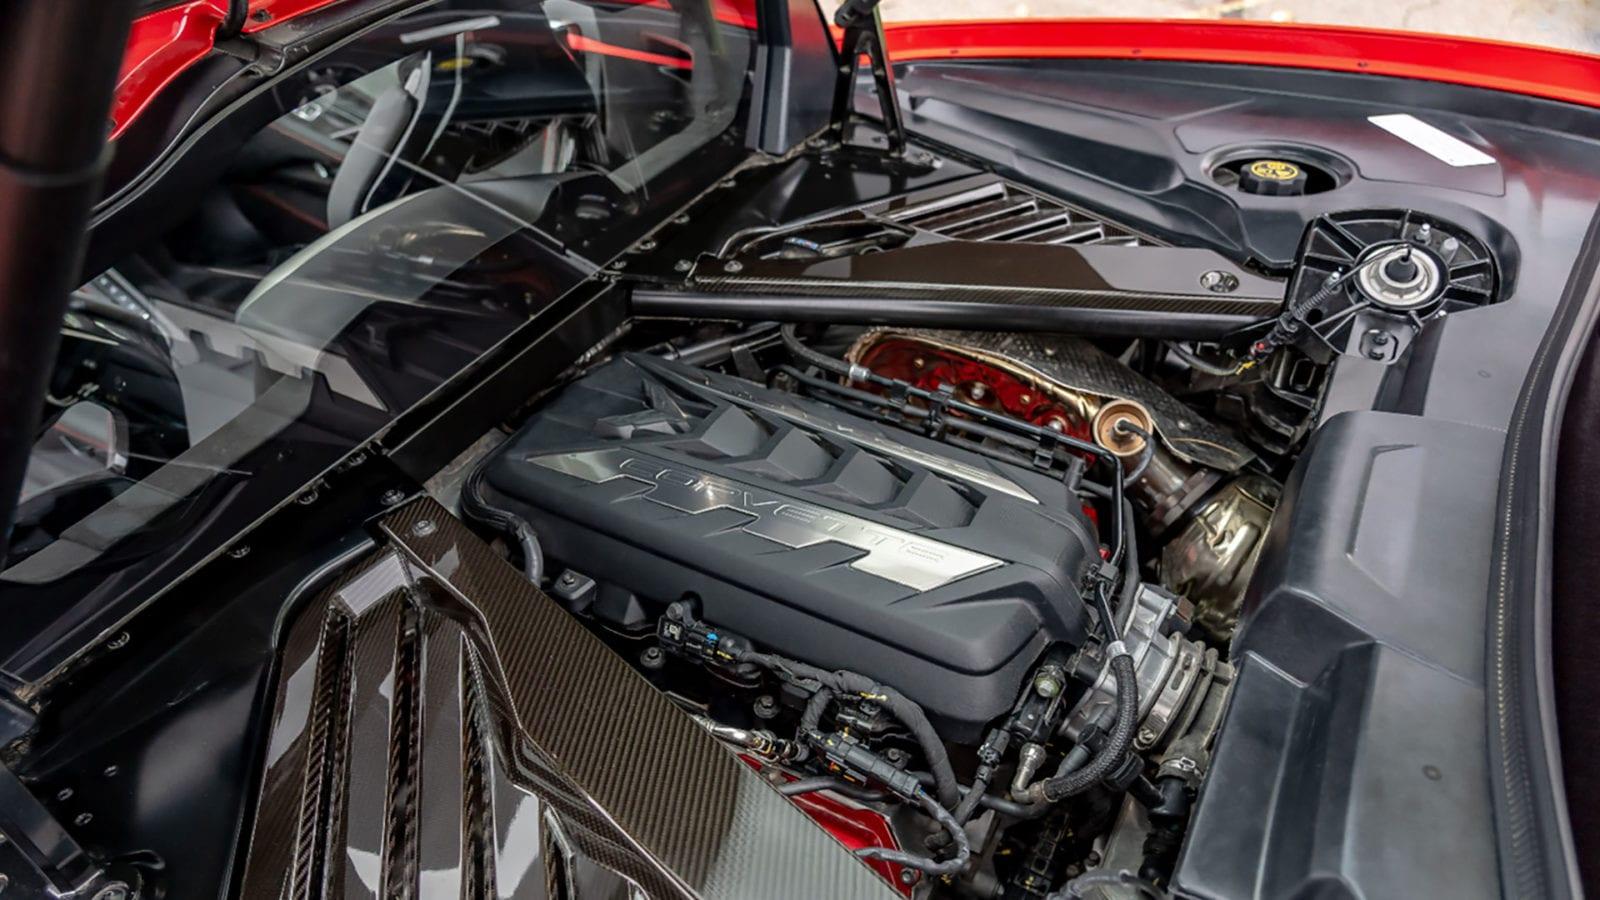 Corvette C8 Z51 Source: Car and Driver